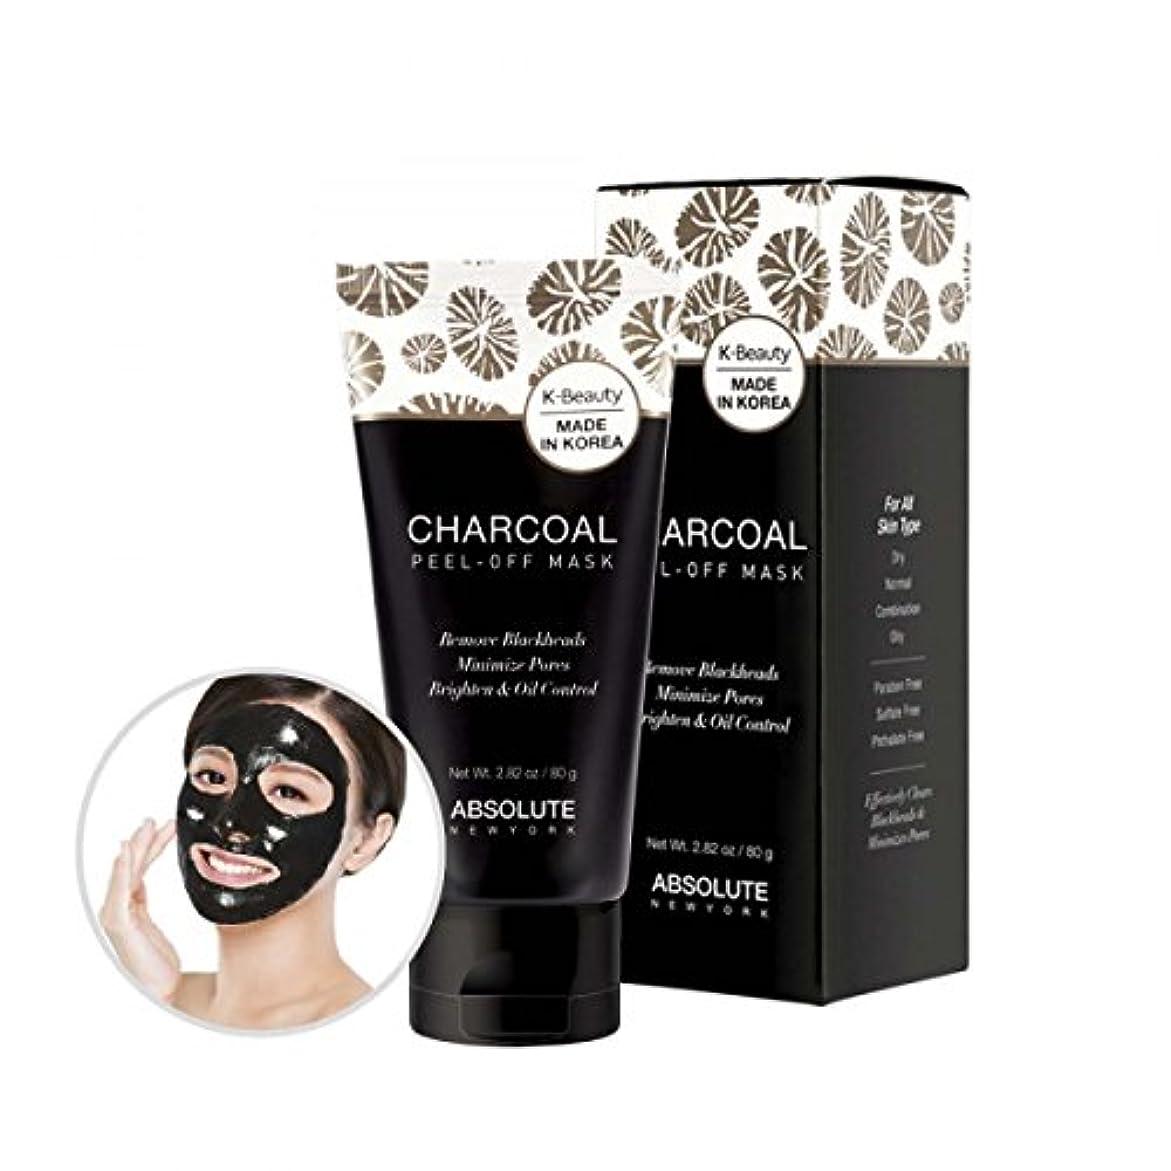 ABSOLUTE Charcoal Peel-Off Mask (並行輸入品)